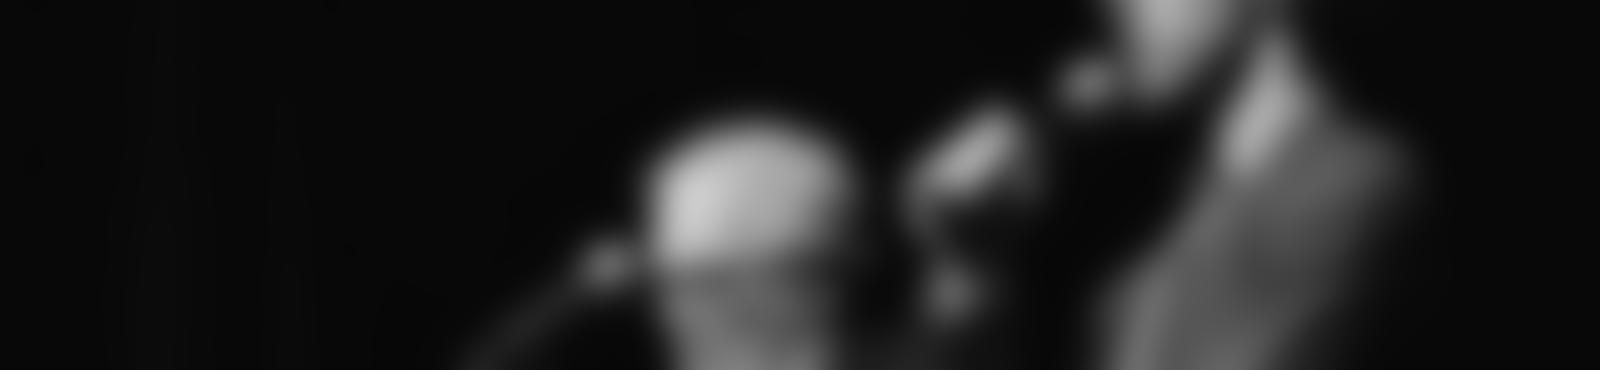 Blurred 895e2aa1 f41c 4df4 aed8 8865e828137e